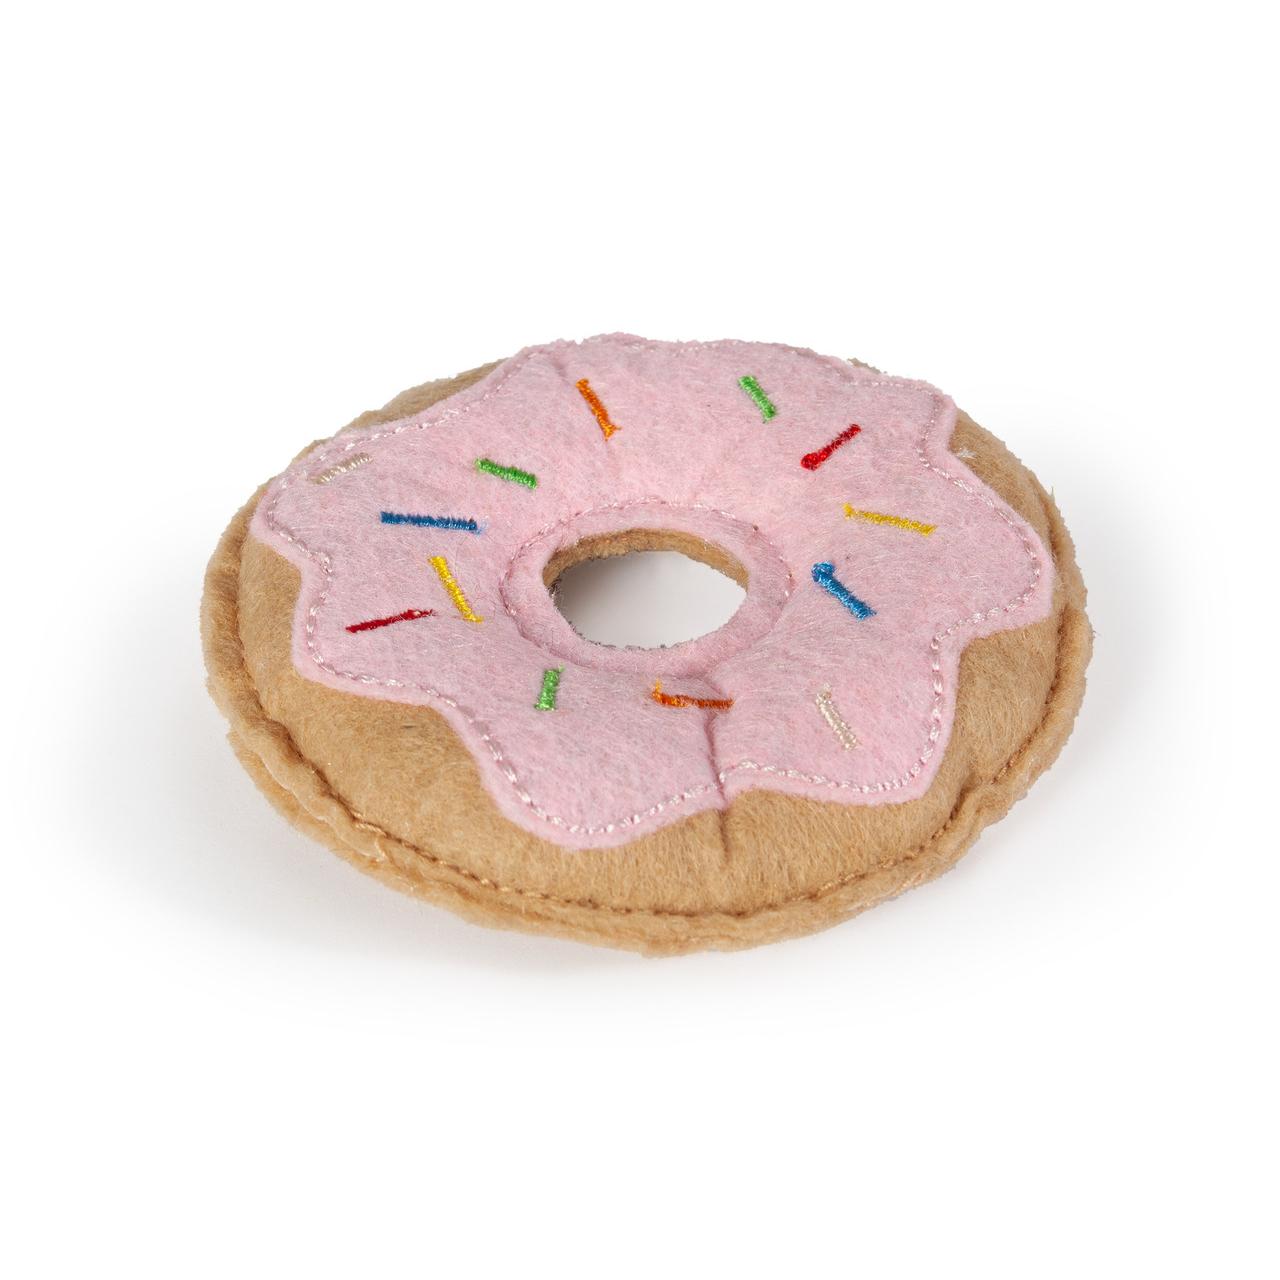 Karlie Katzenspielzeug aus Textil, Donut - L: 7.5 cm